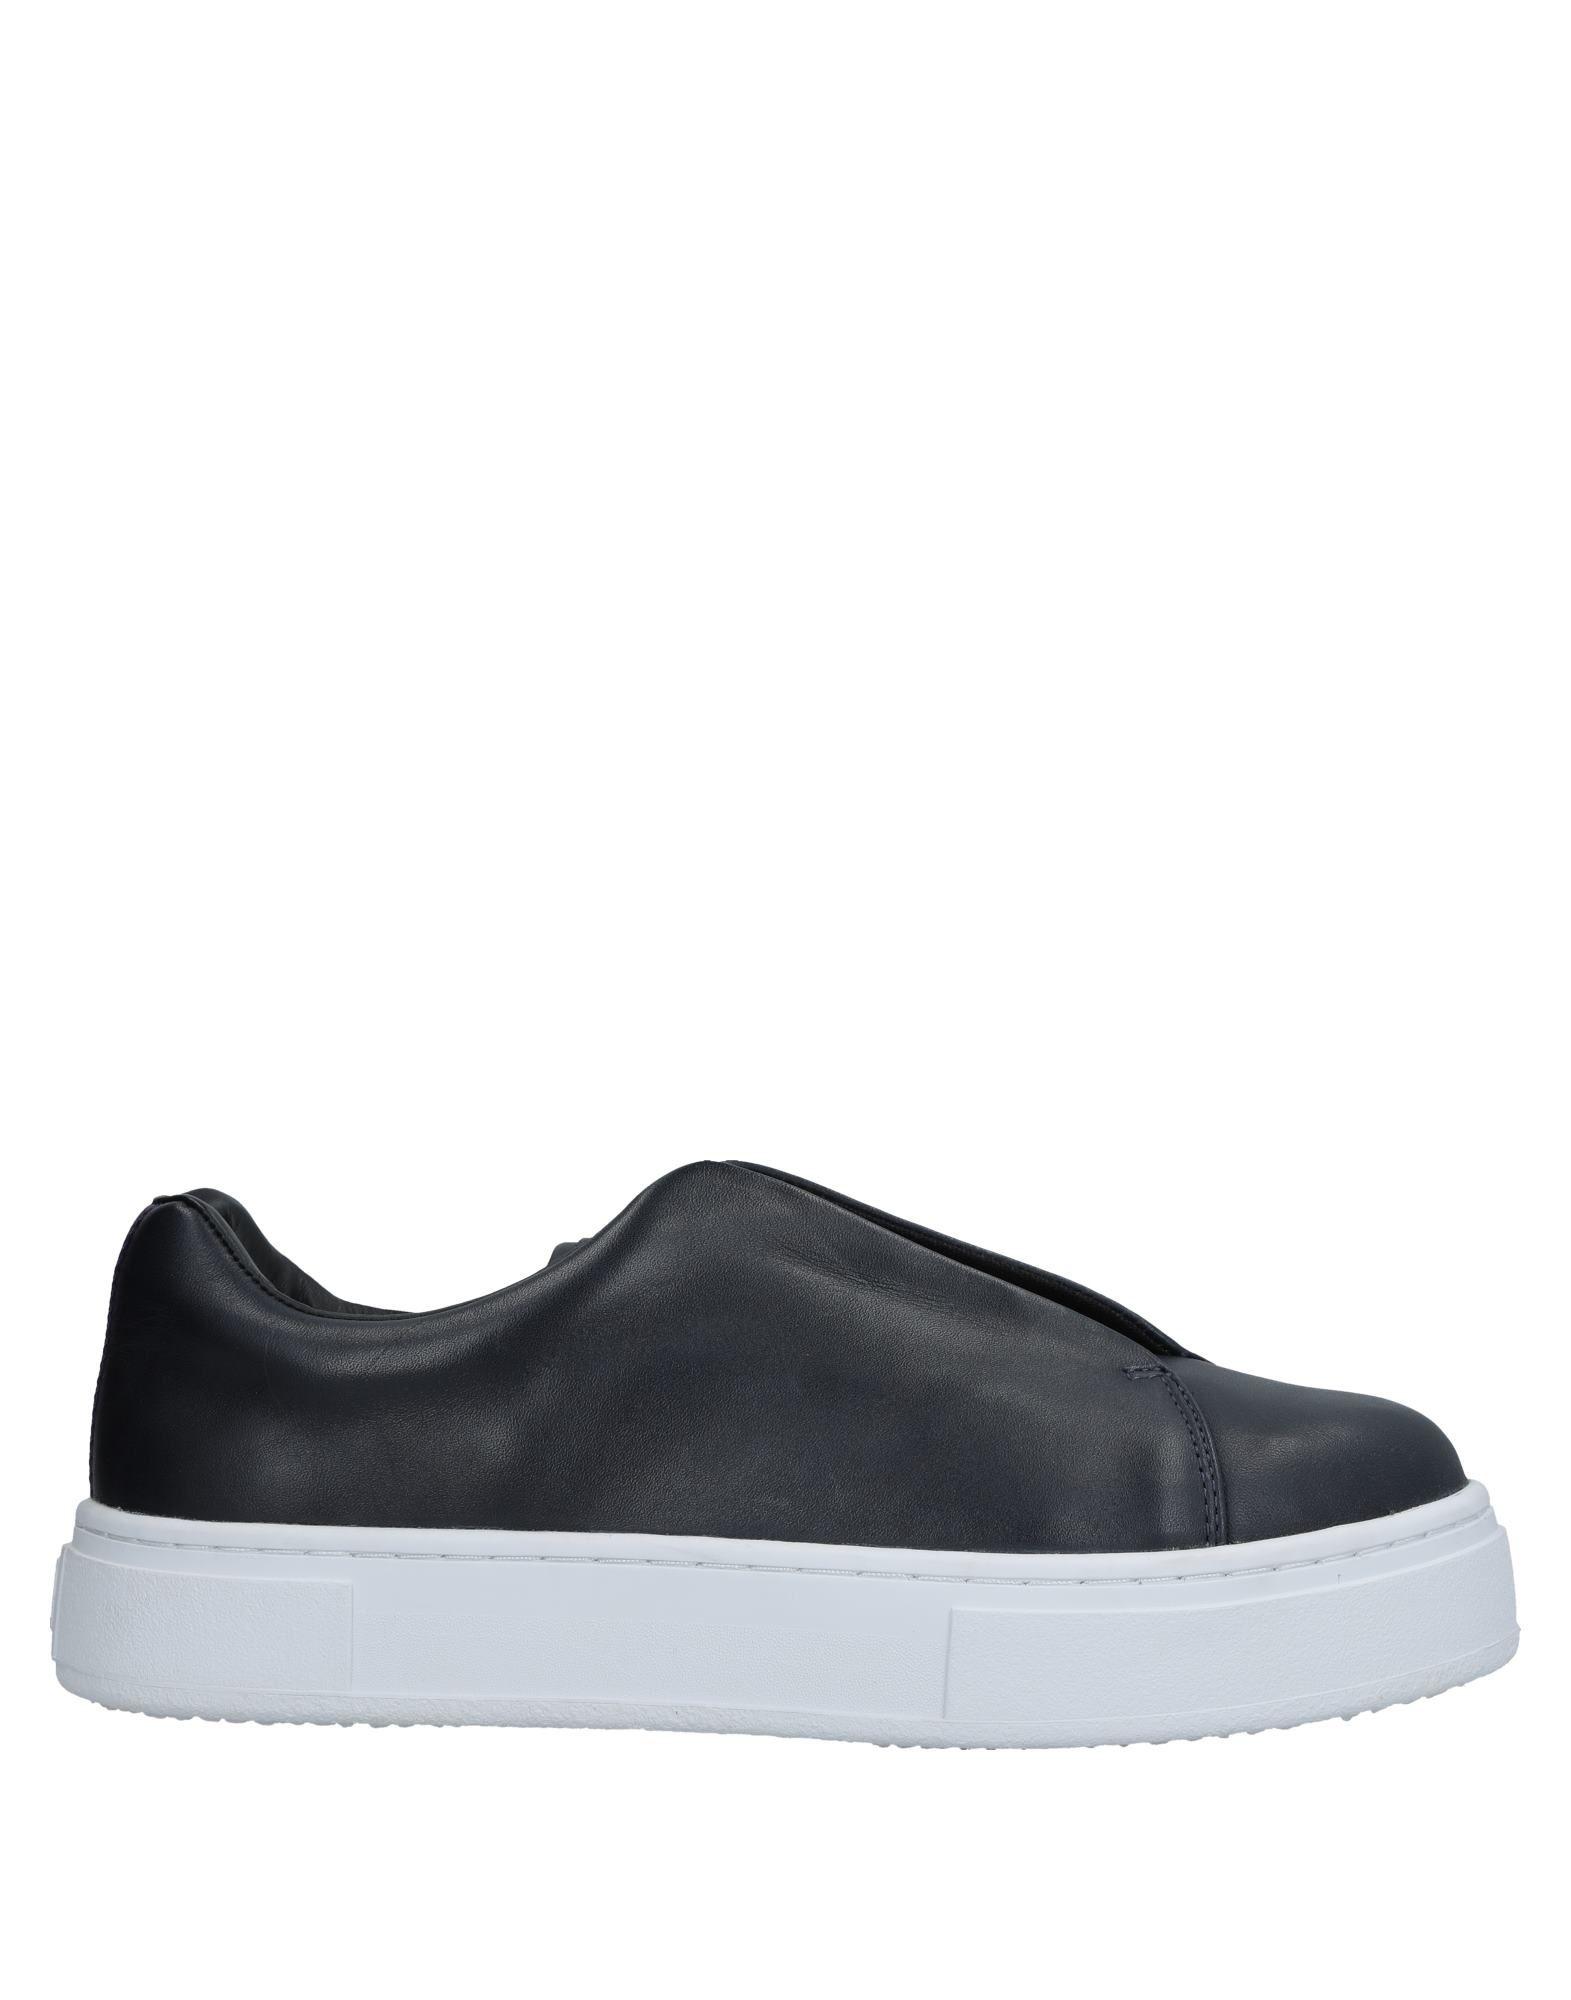 Eytys Sneakers - Canada Men Eytys Sneakers online on  Canada - - 11524097AO d1b92d